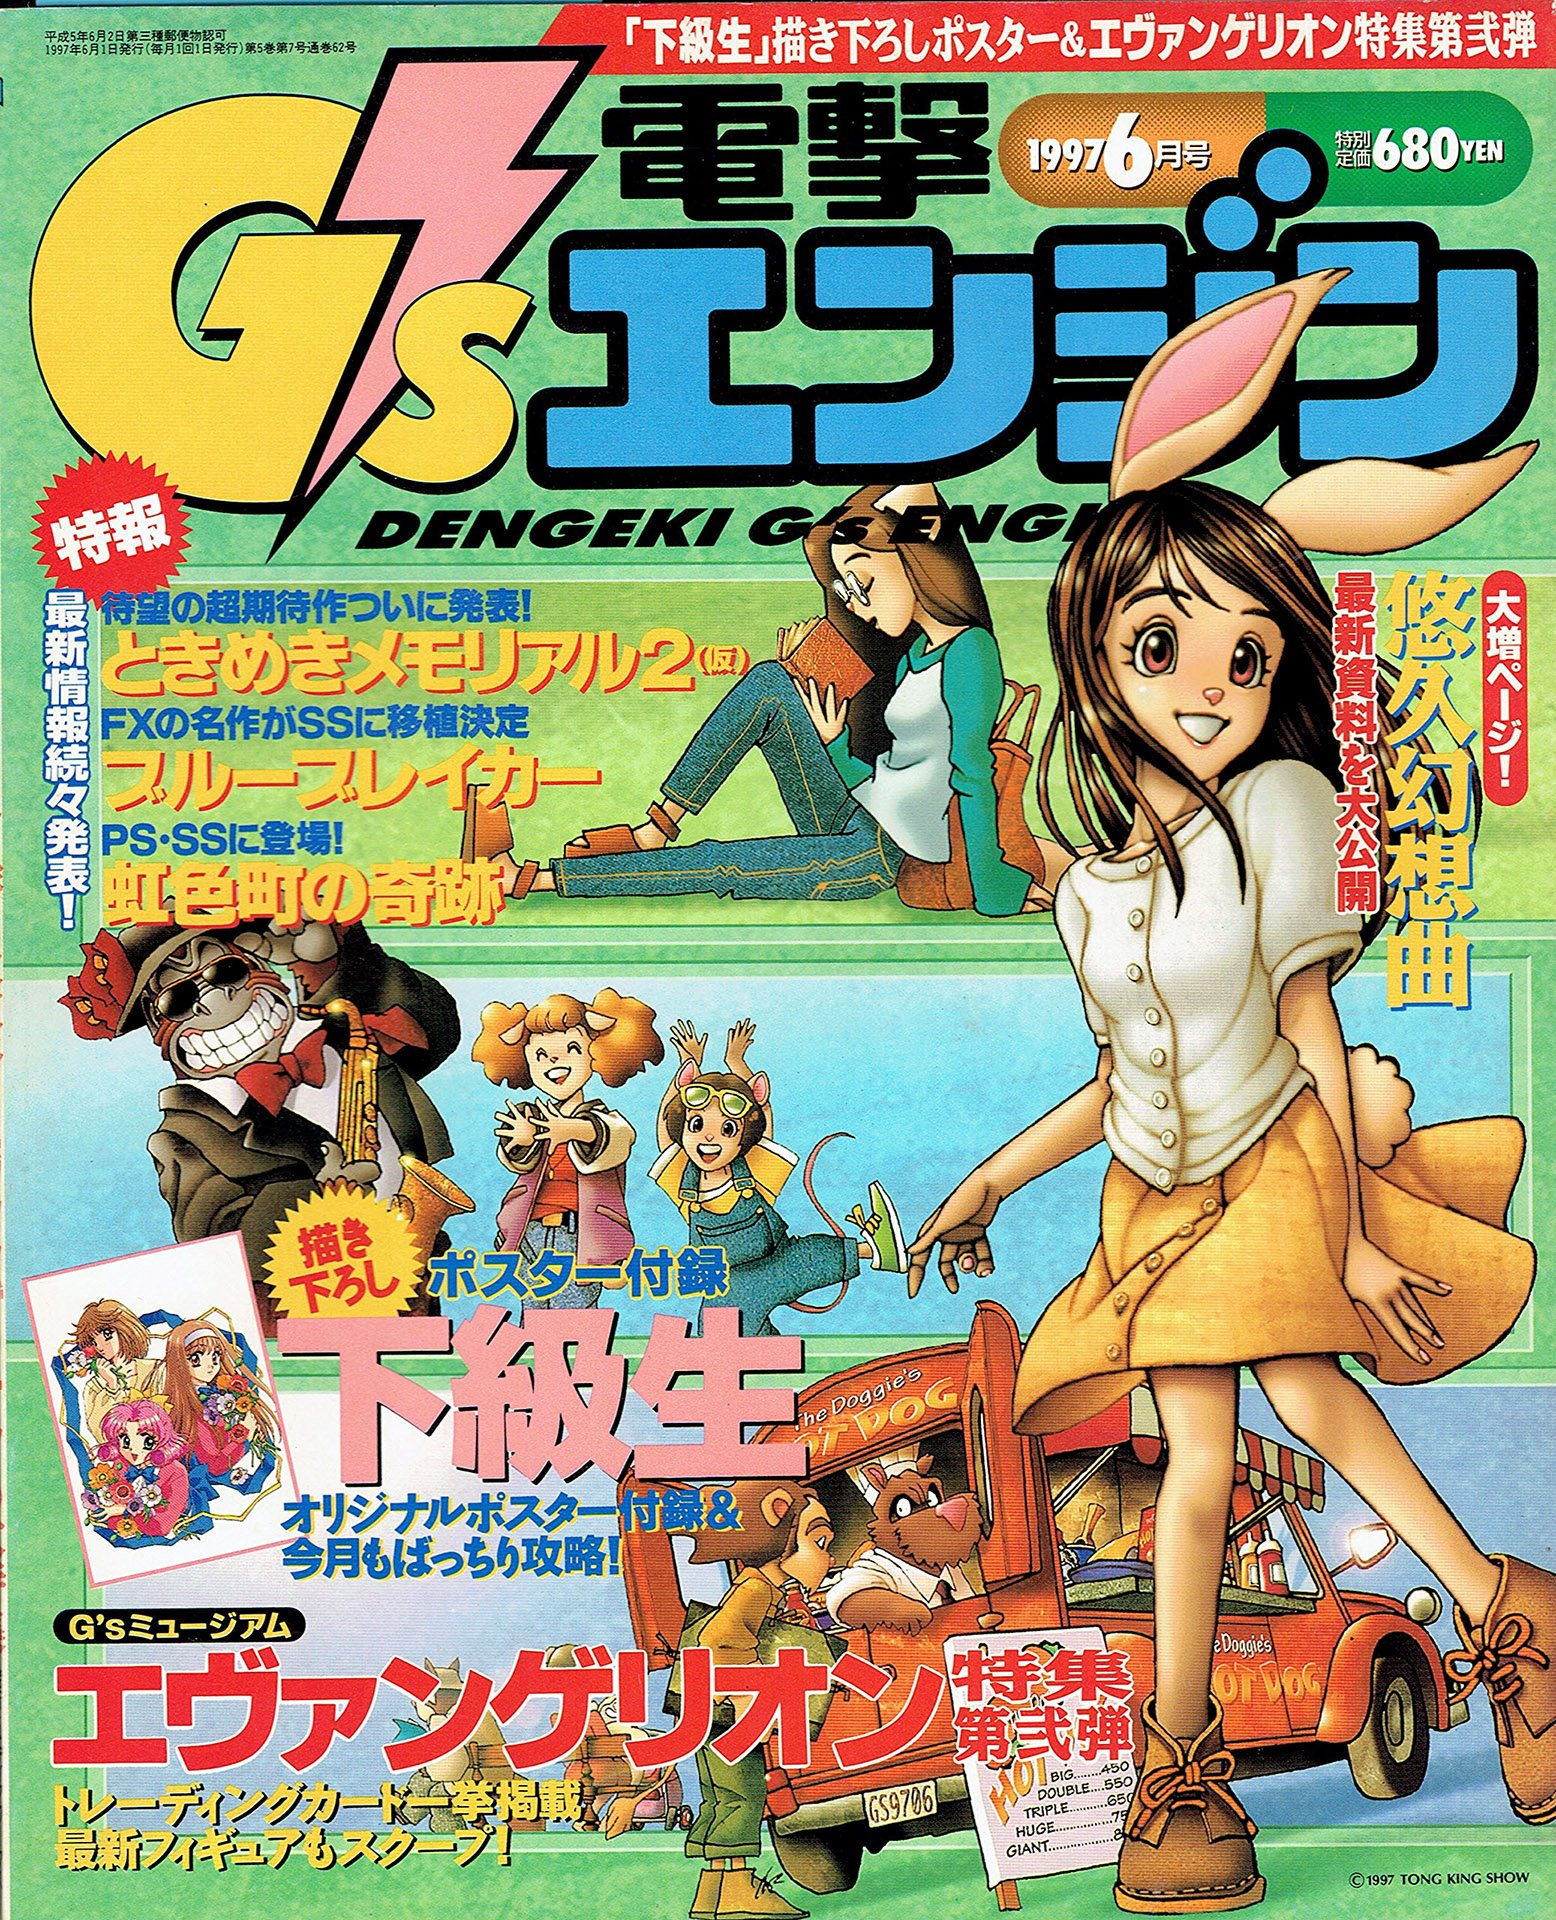 Dengeki G's Engine Issue 13 (June 1997)